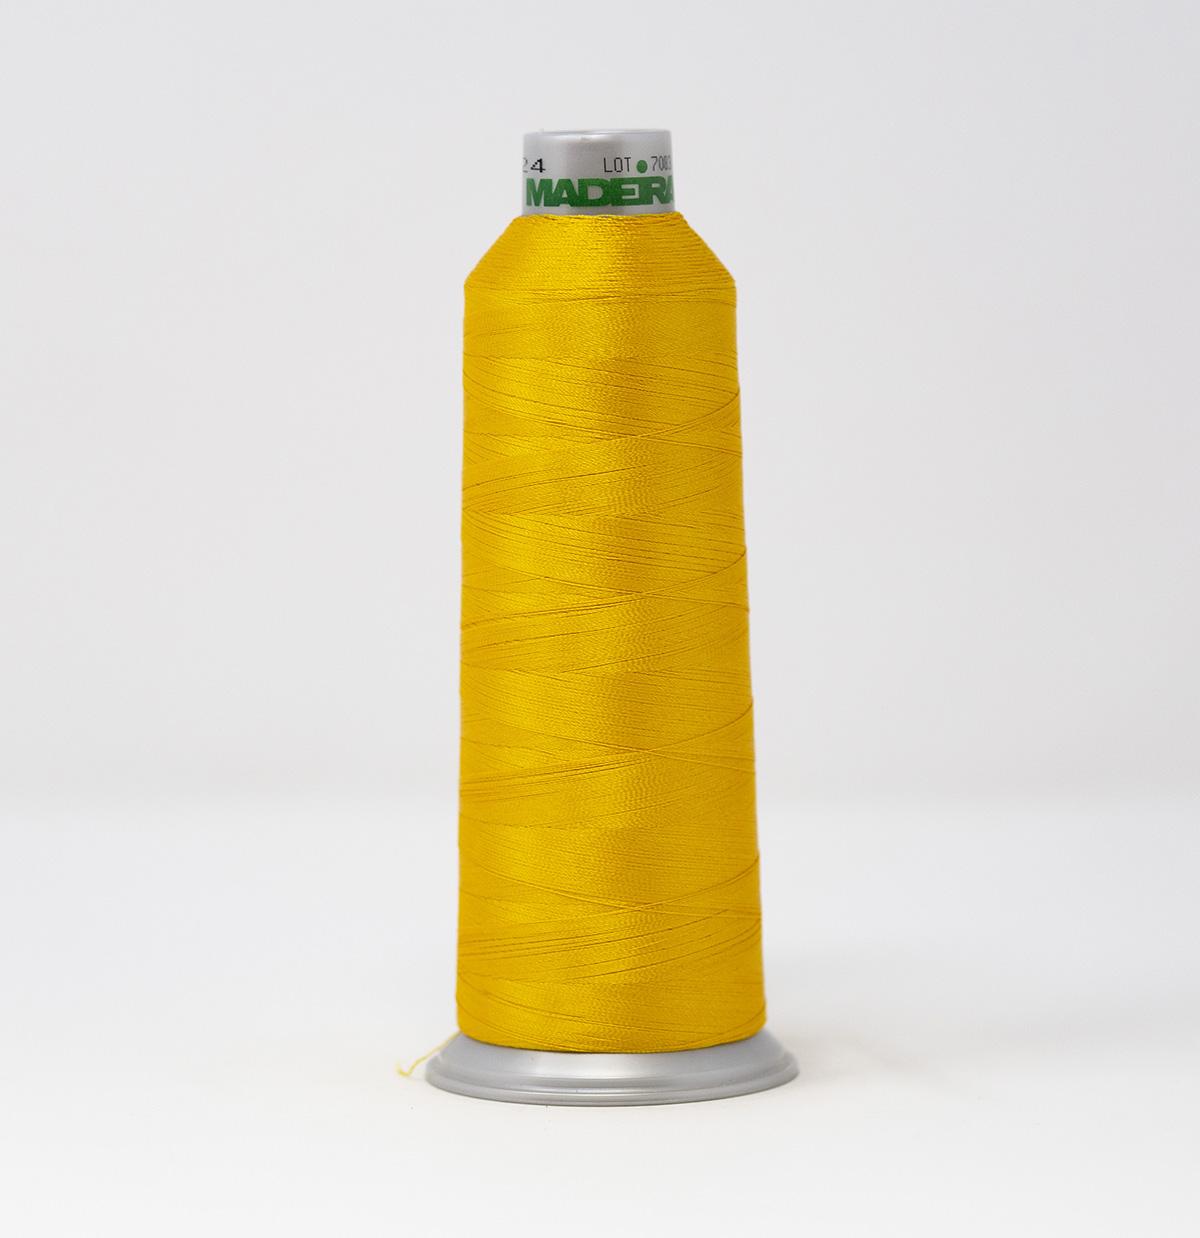 Madeira Polyneon Embroidery Thread 40 wt 1000 M Spool Color # 1624